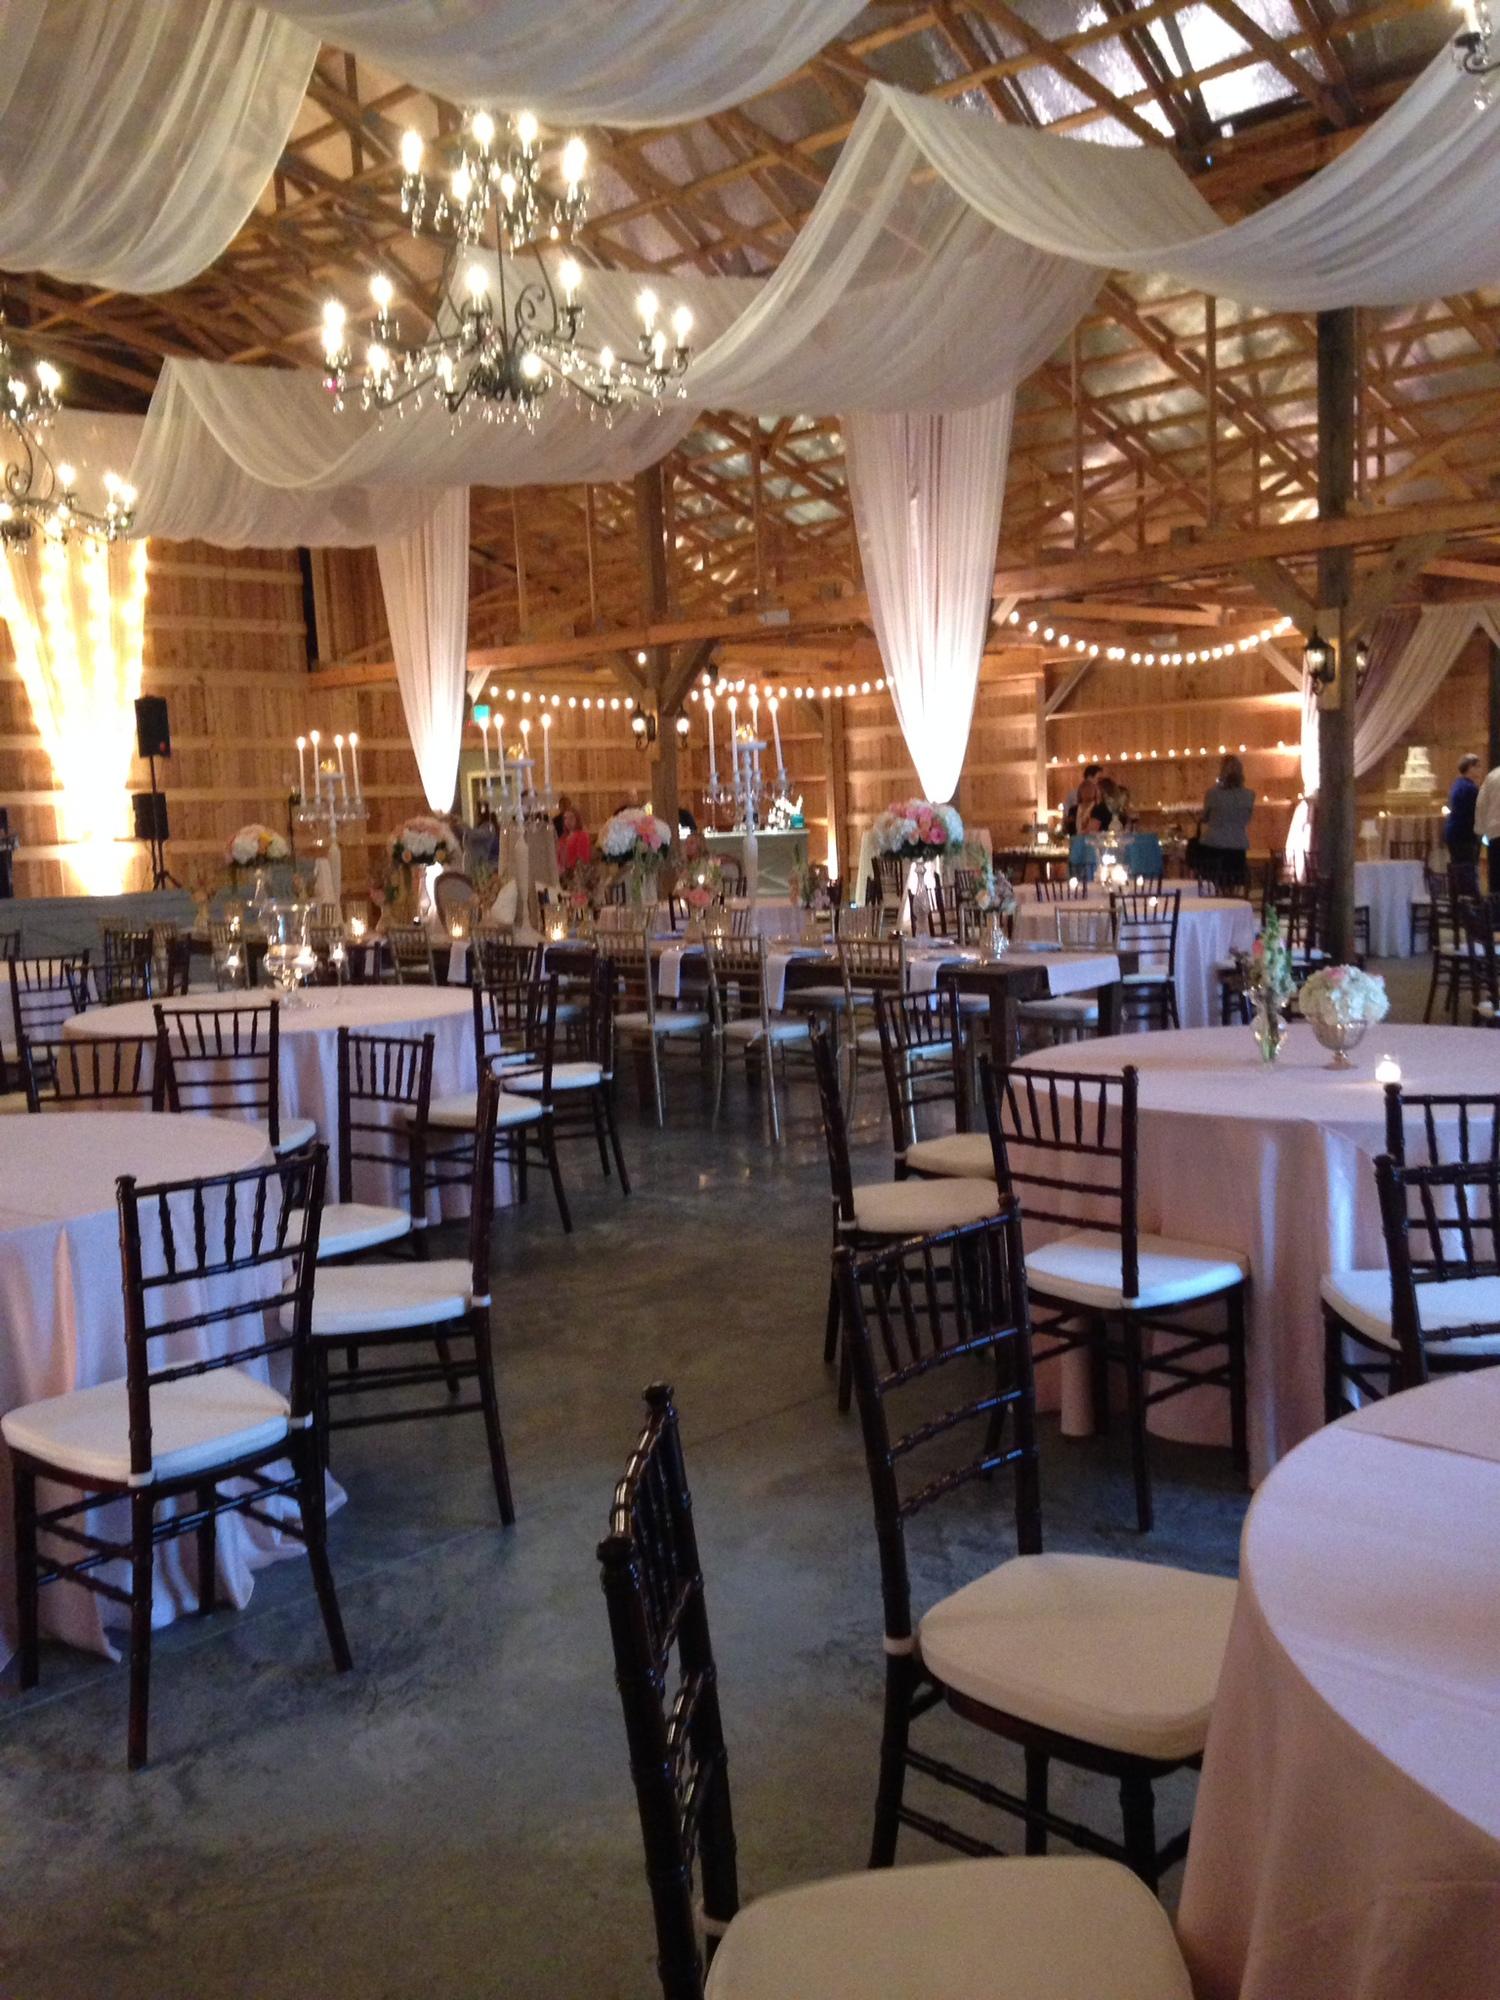 SaddleWoodsFarm4-Nashville-Barn-Wedding.jpg